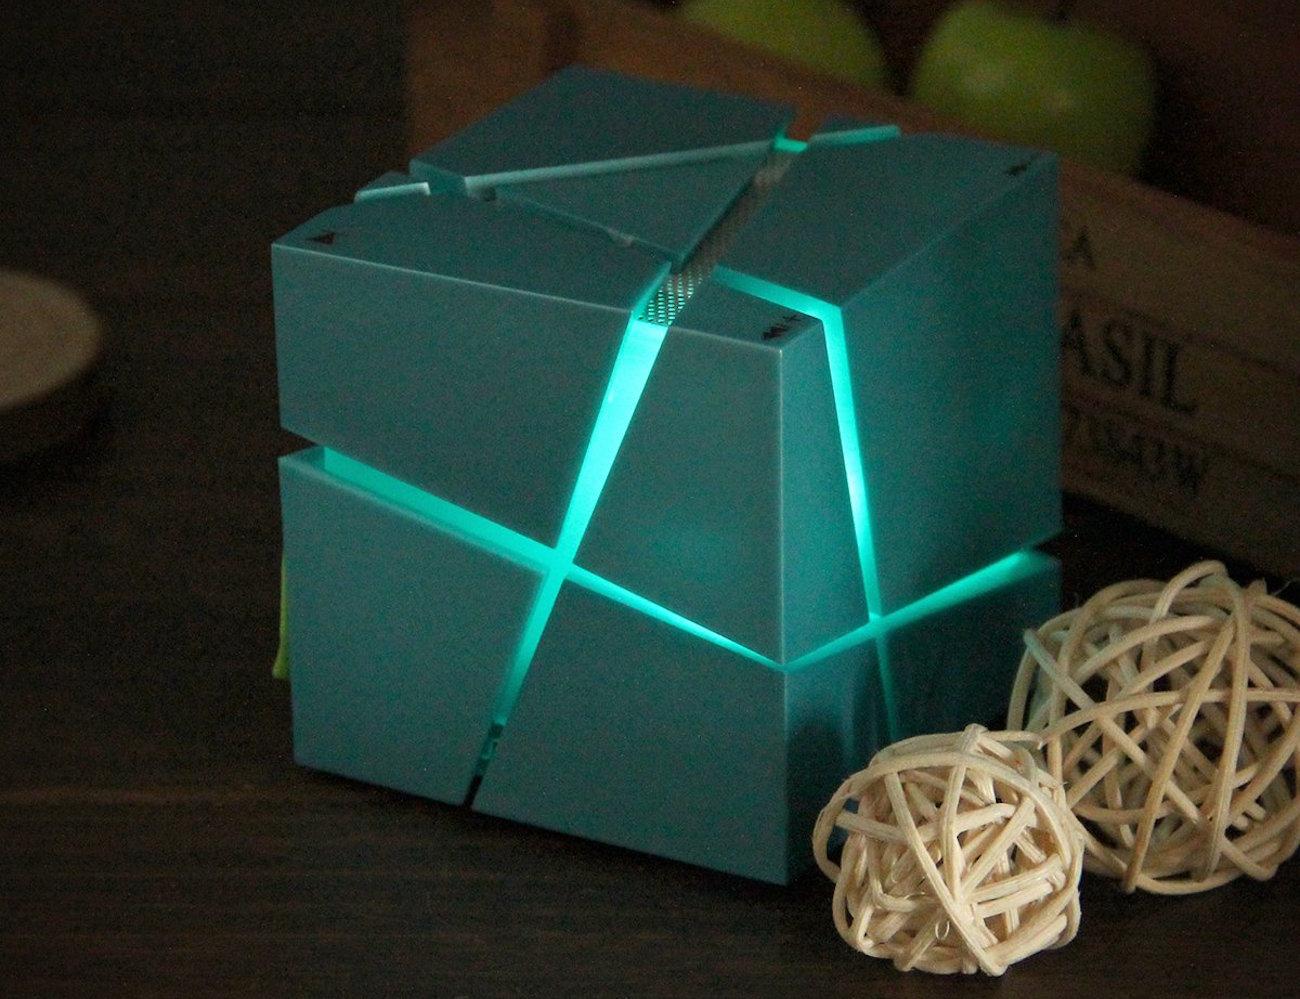 LED+Cube+Wireless+Bluetooth+Speaker